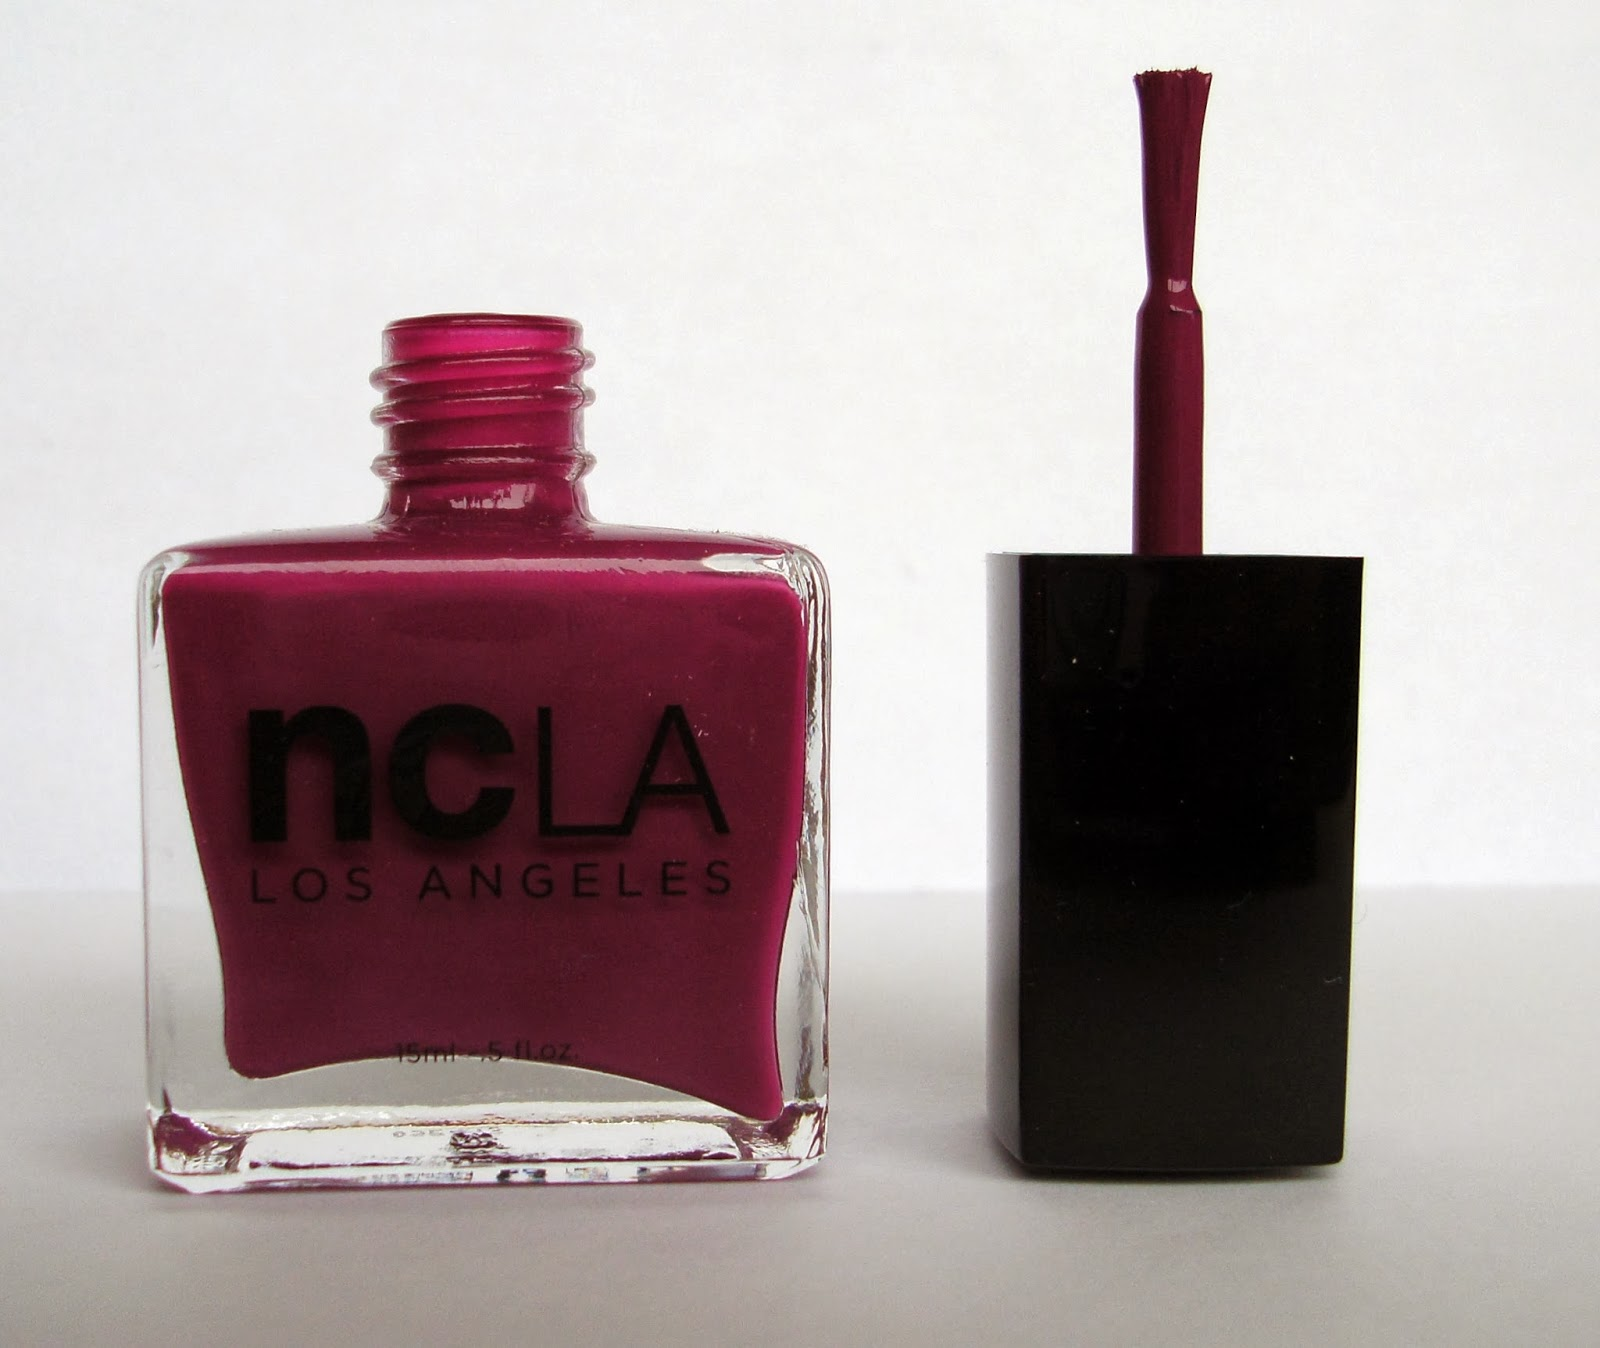 ncLA Nail Lacquer - Nail Lacquer Laurel Canyon Lolita